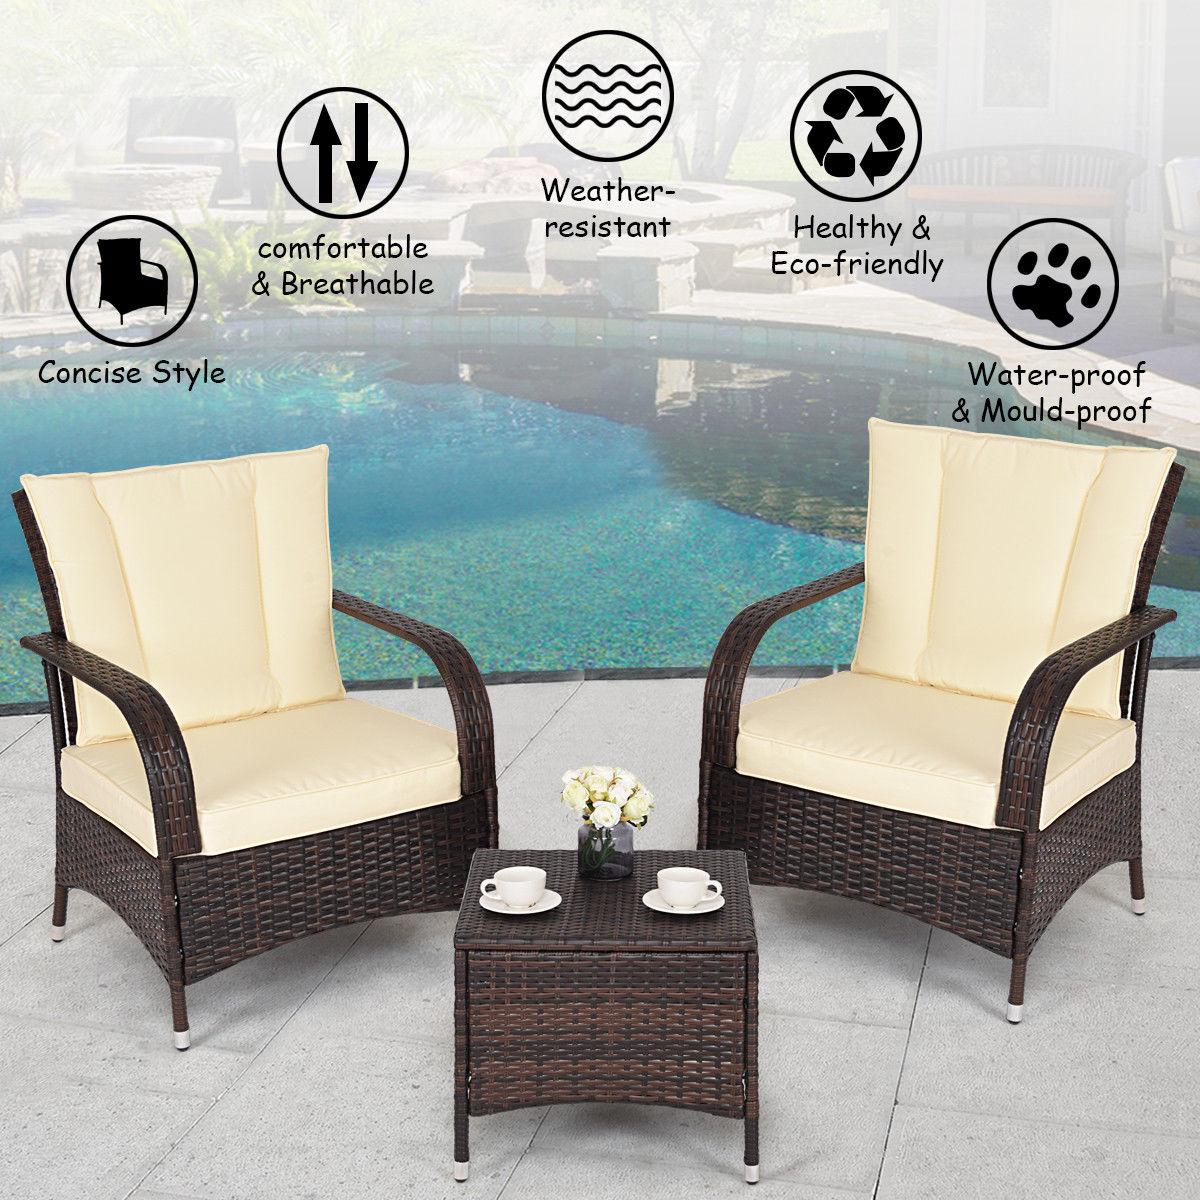 3pcs Outdoor Patio Mix Brown Rattan Wicker Furniture Set